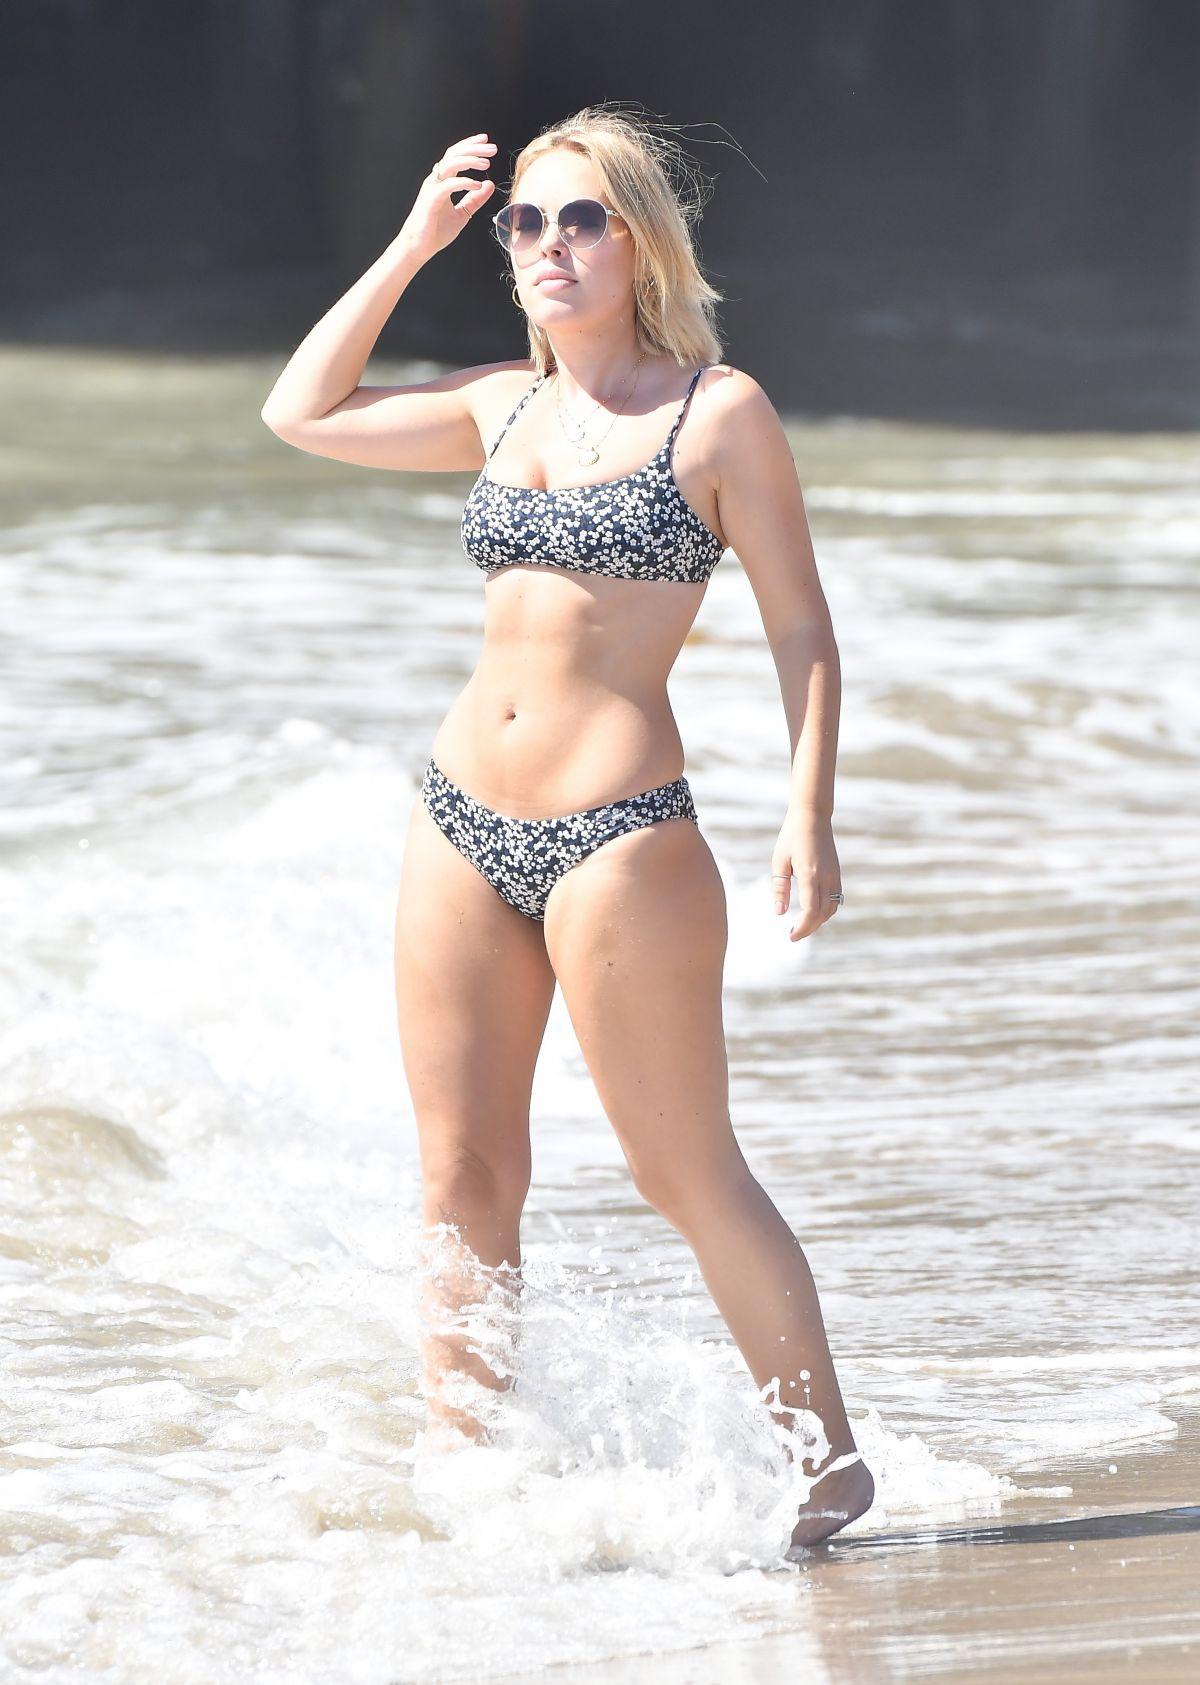 Bikini Tanya Burr nude photos 2019